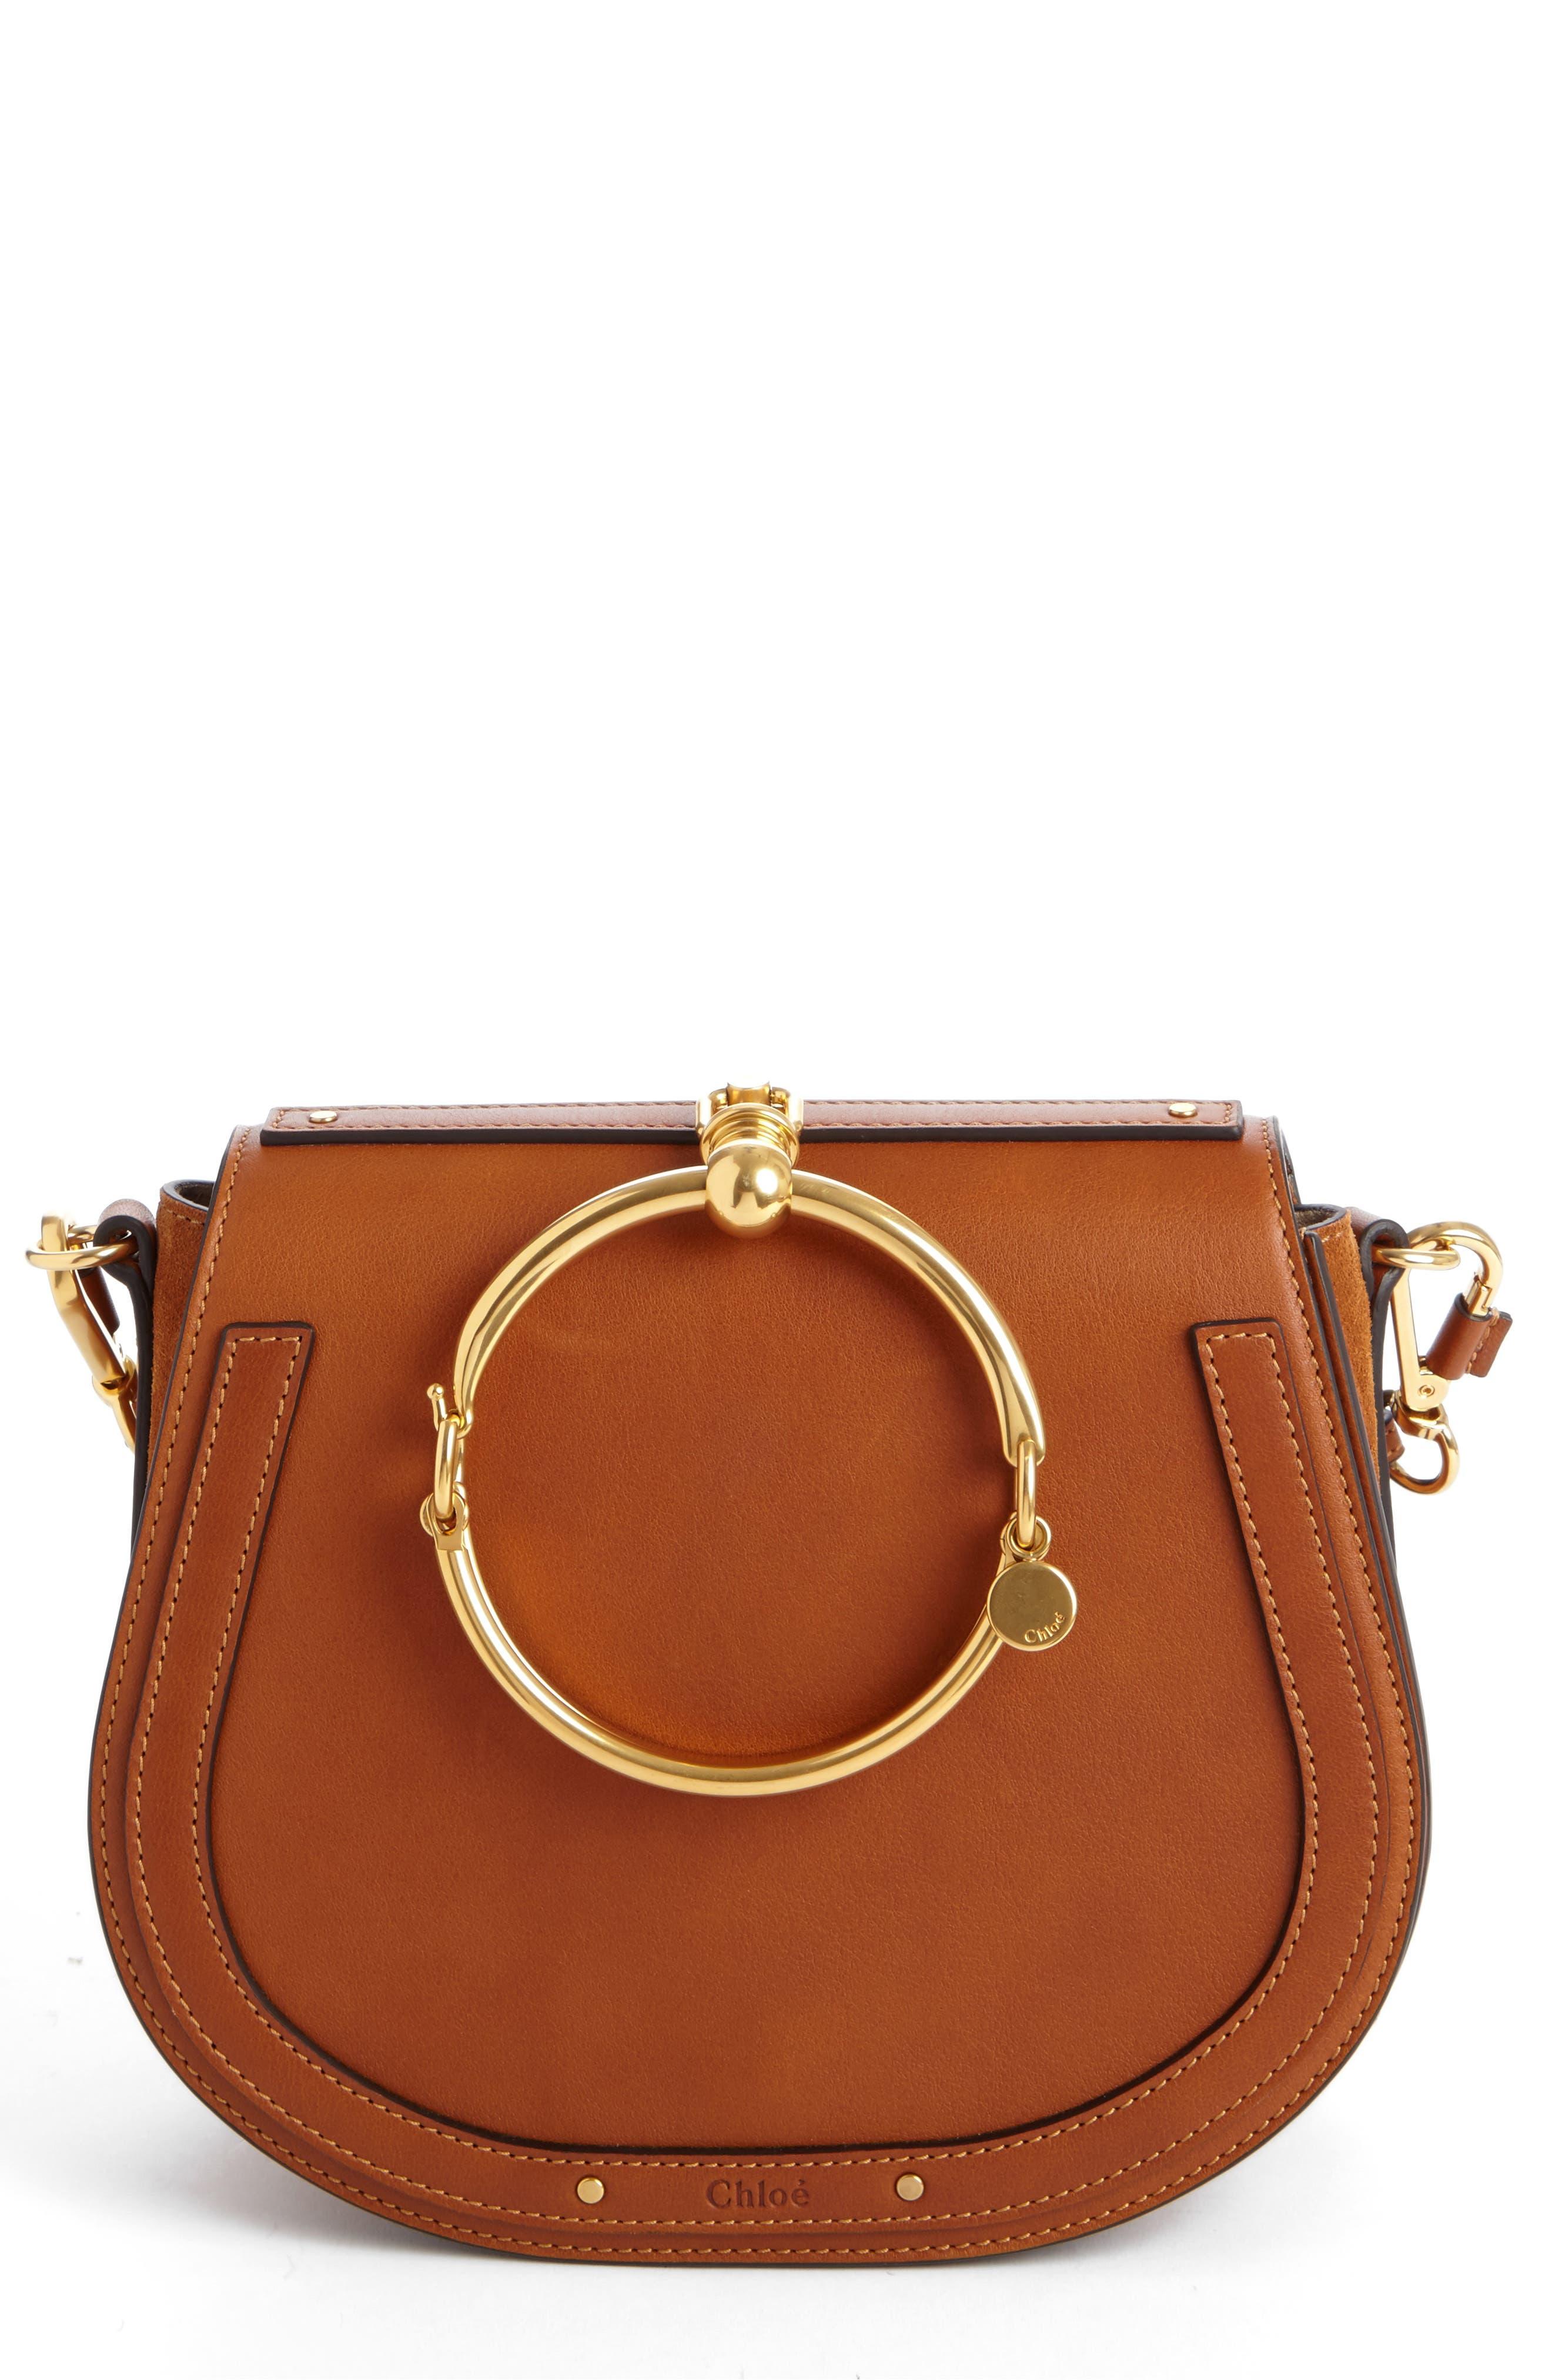 Medium Nile Leather Bracelet Saddle Bag,                             Main thumbnail 1, color,                             Bdu Caramel